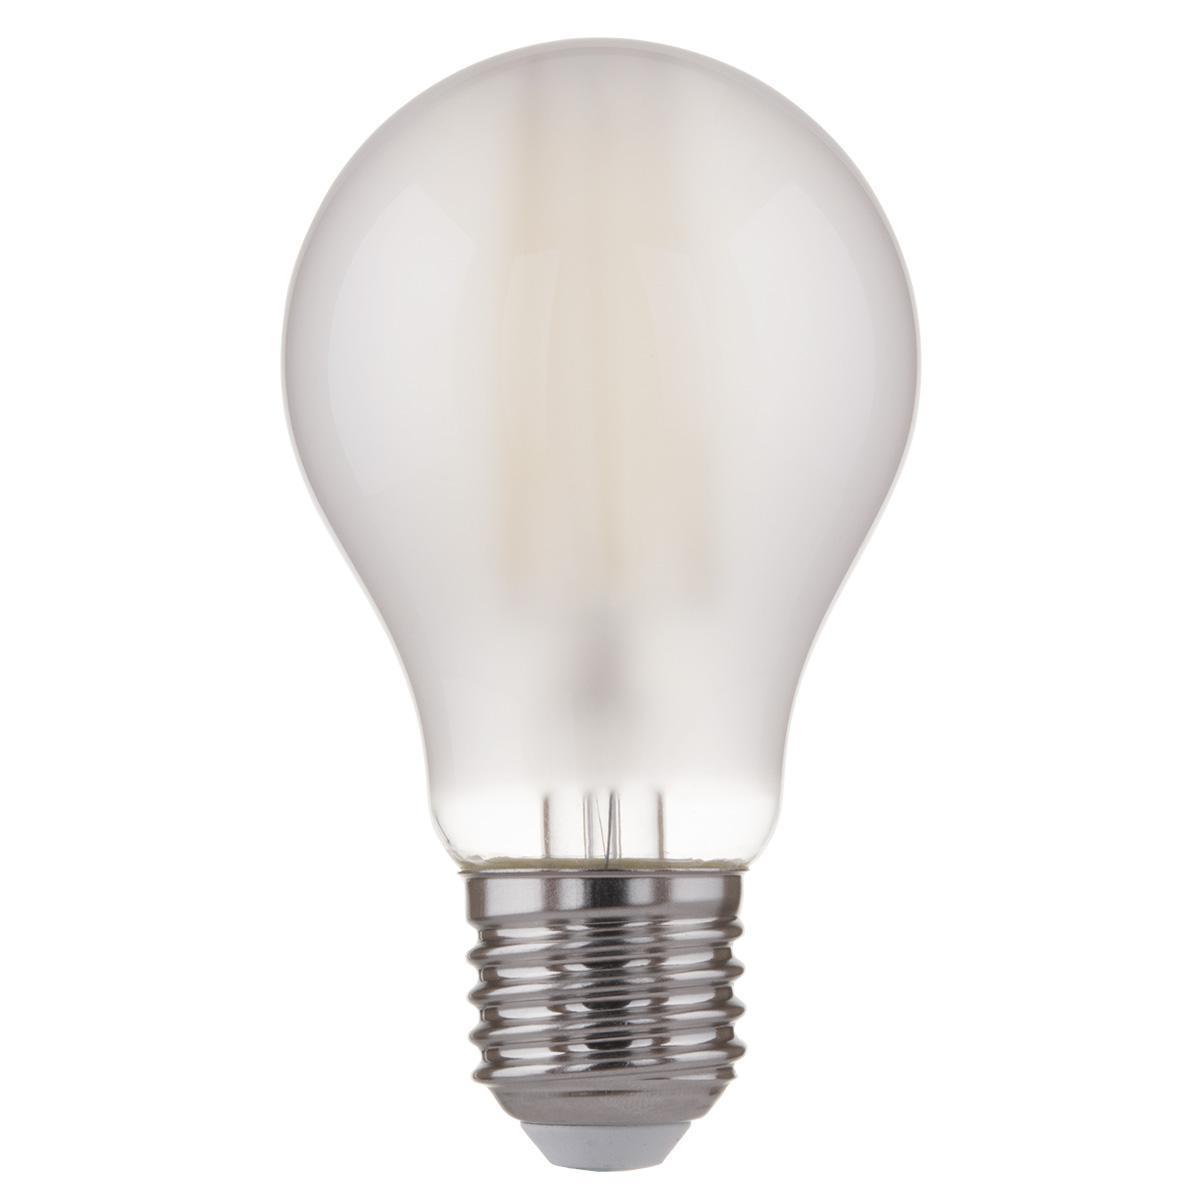 elektrostandard лампа светодиодная elektrostandard classic led d 10w 4200k e27 4690389085543 Лампа светодиодная филаментная LED E27 12W 4200K матовая 4690389108358